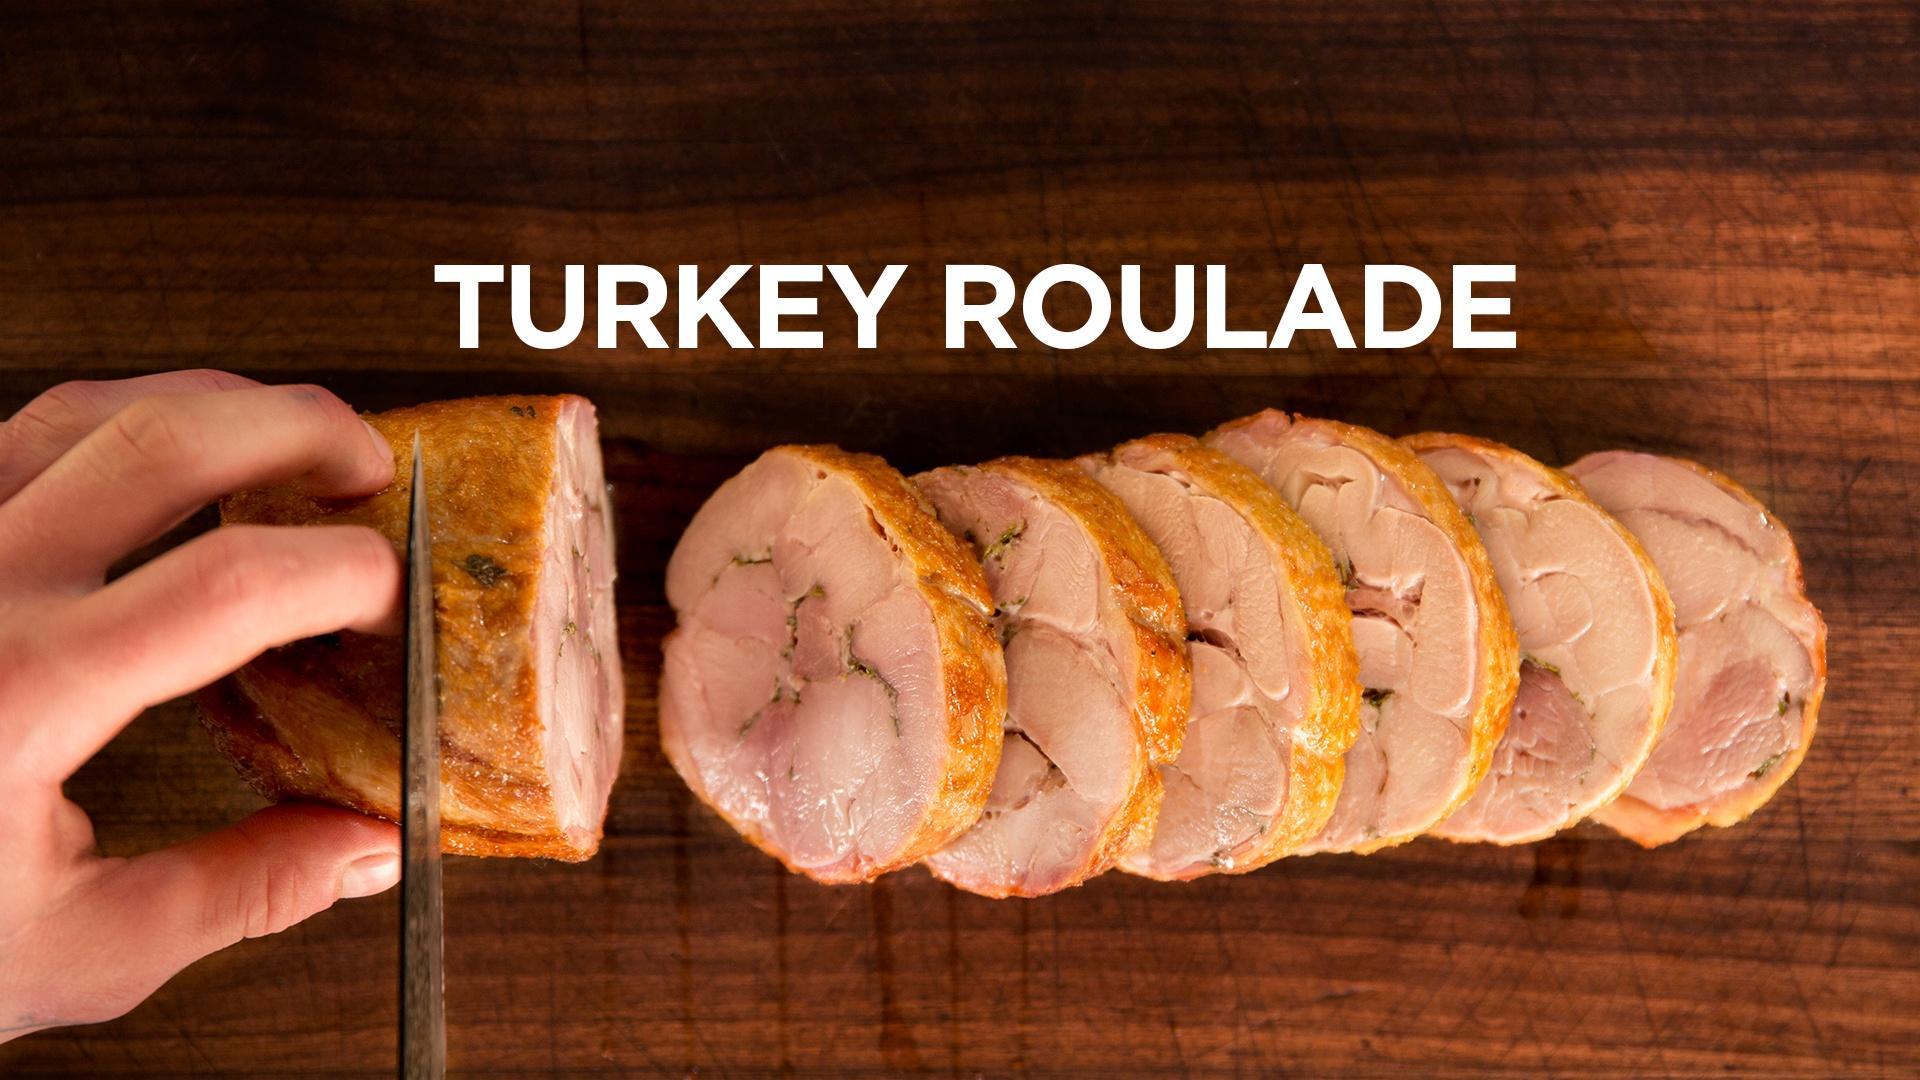 Chefsteps Turkey Roulade Season 2014 Episode 42 Pbs